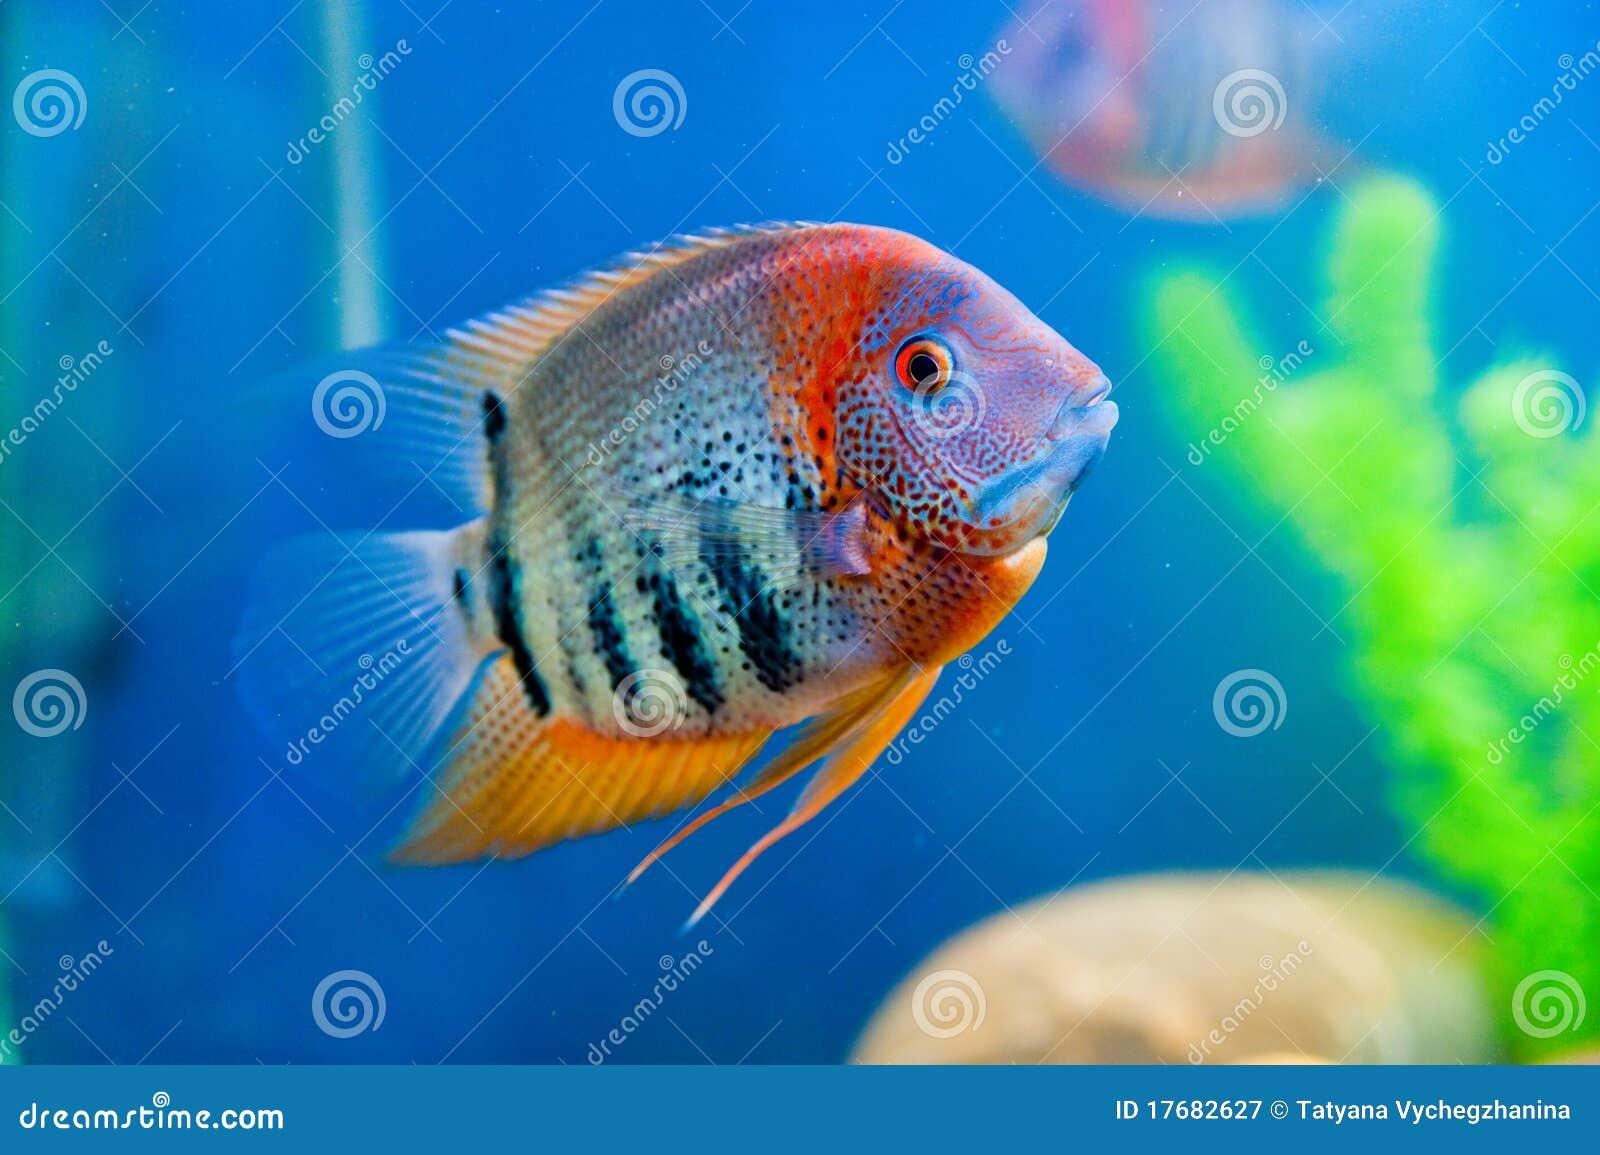 Colorful Fish Aquarium Royalty Free Stock Photography